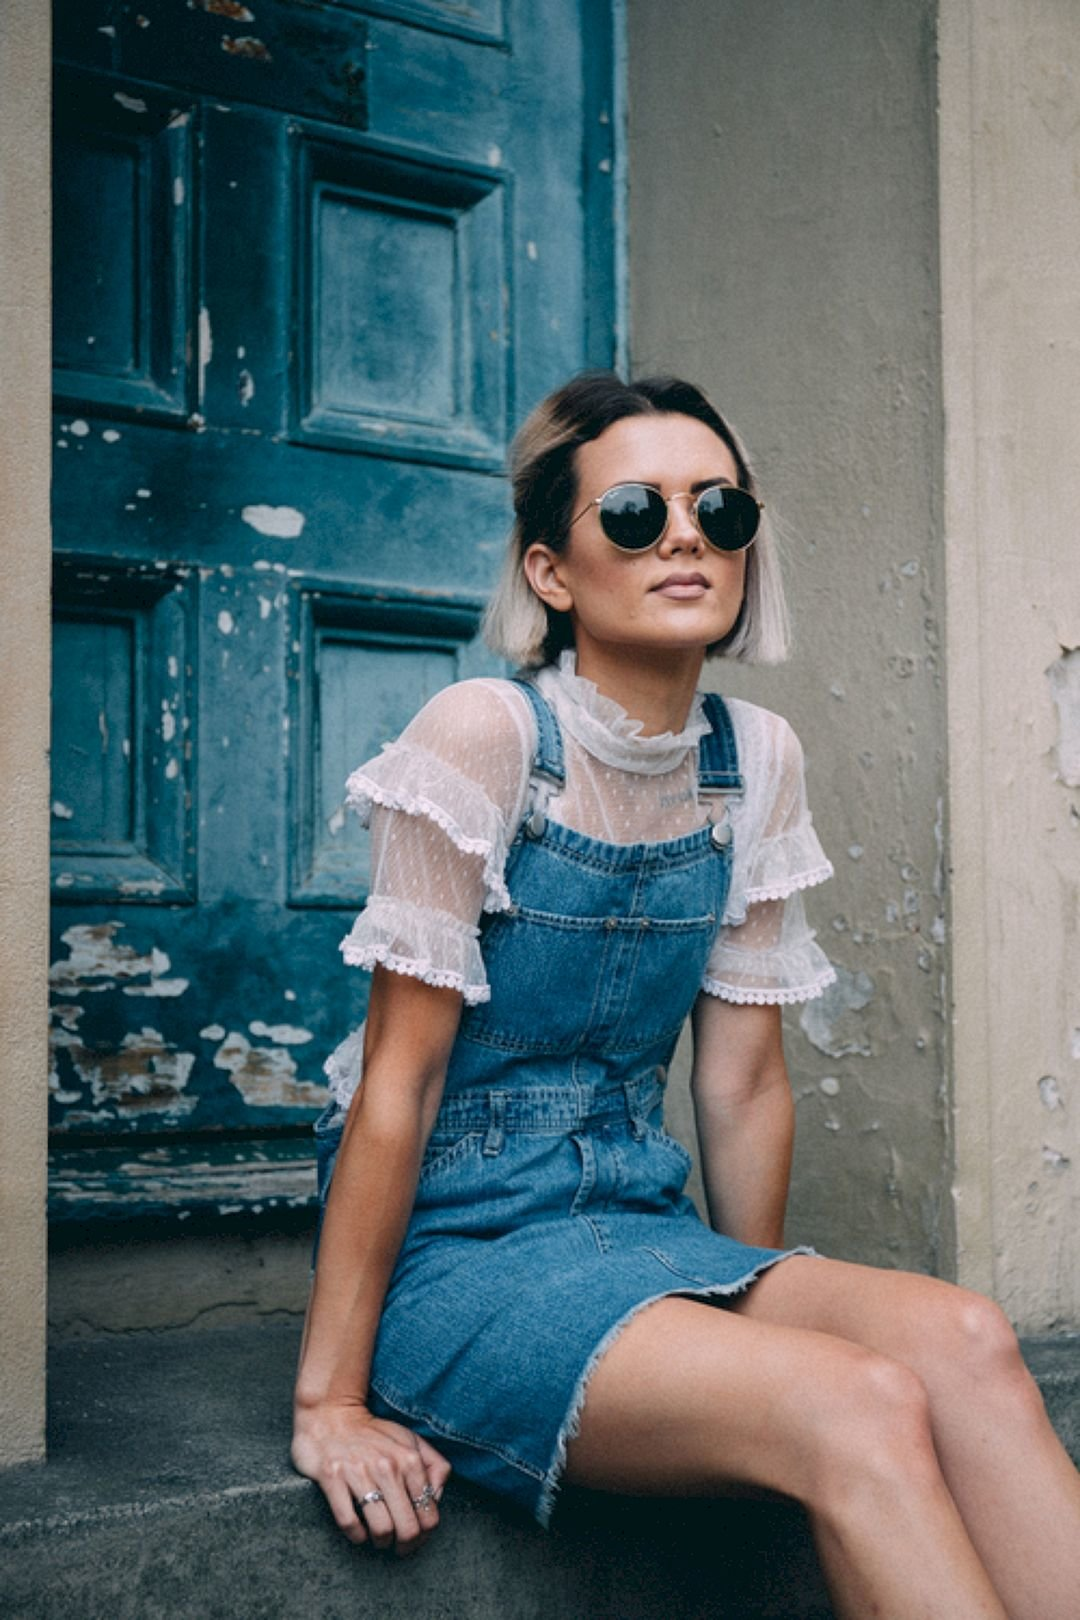 Джинсовый сарафан уличная мода